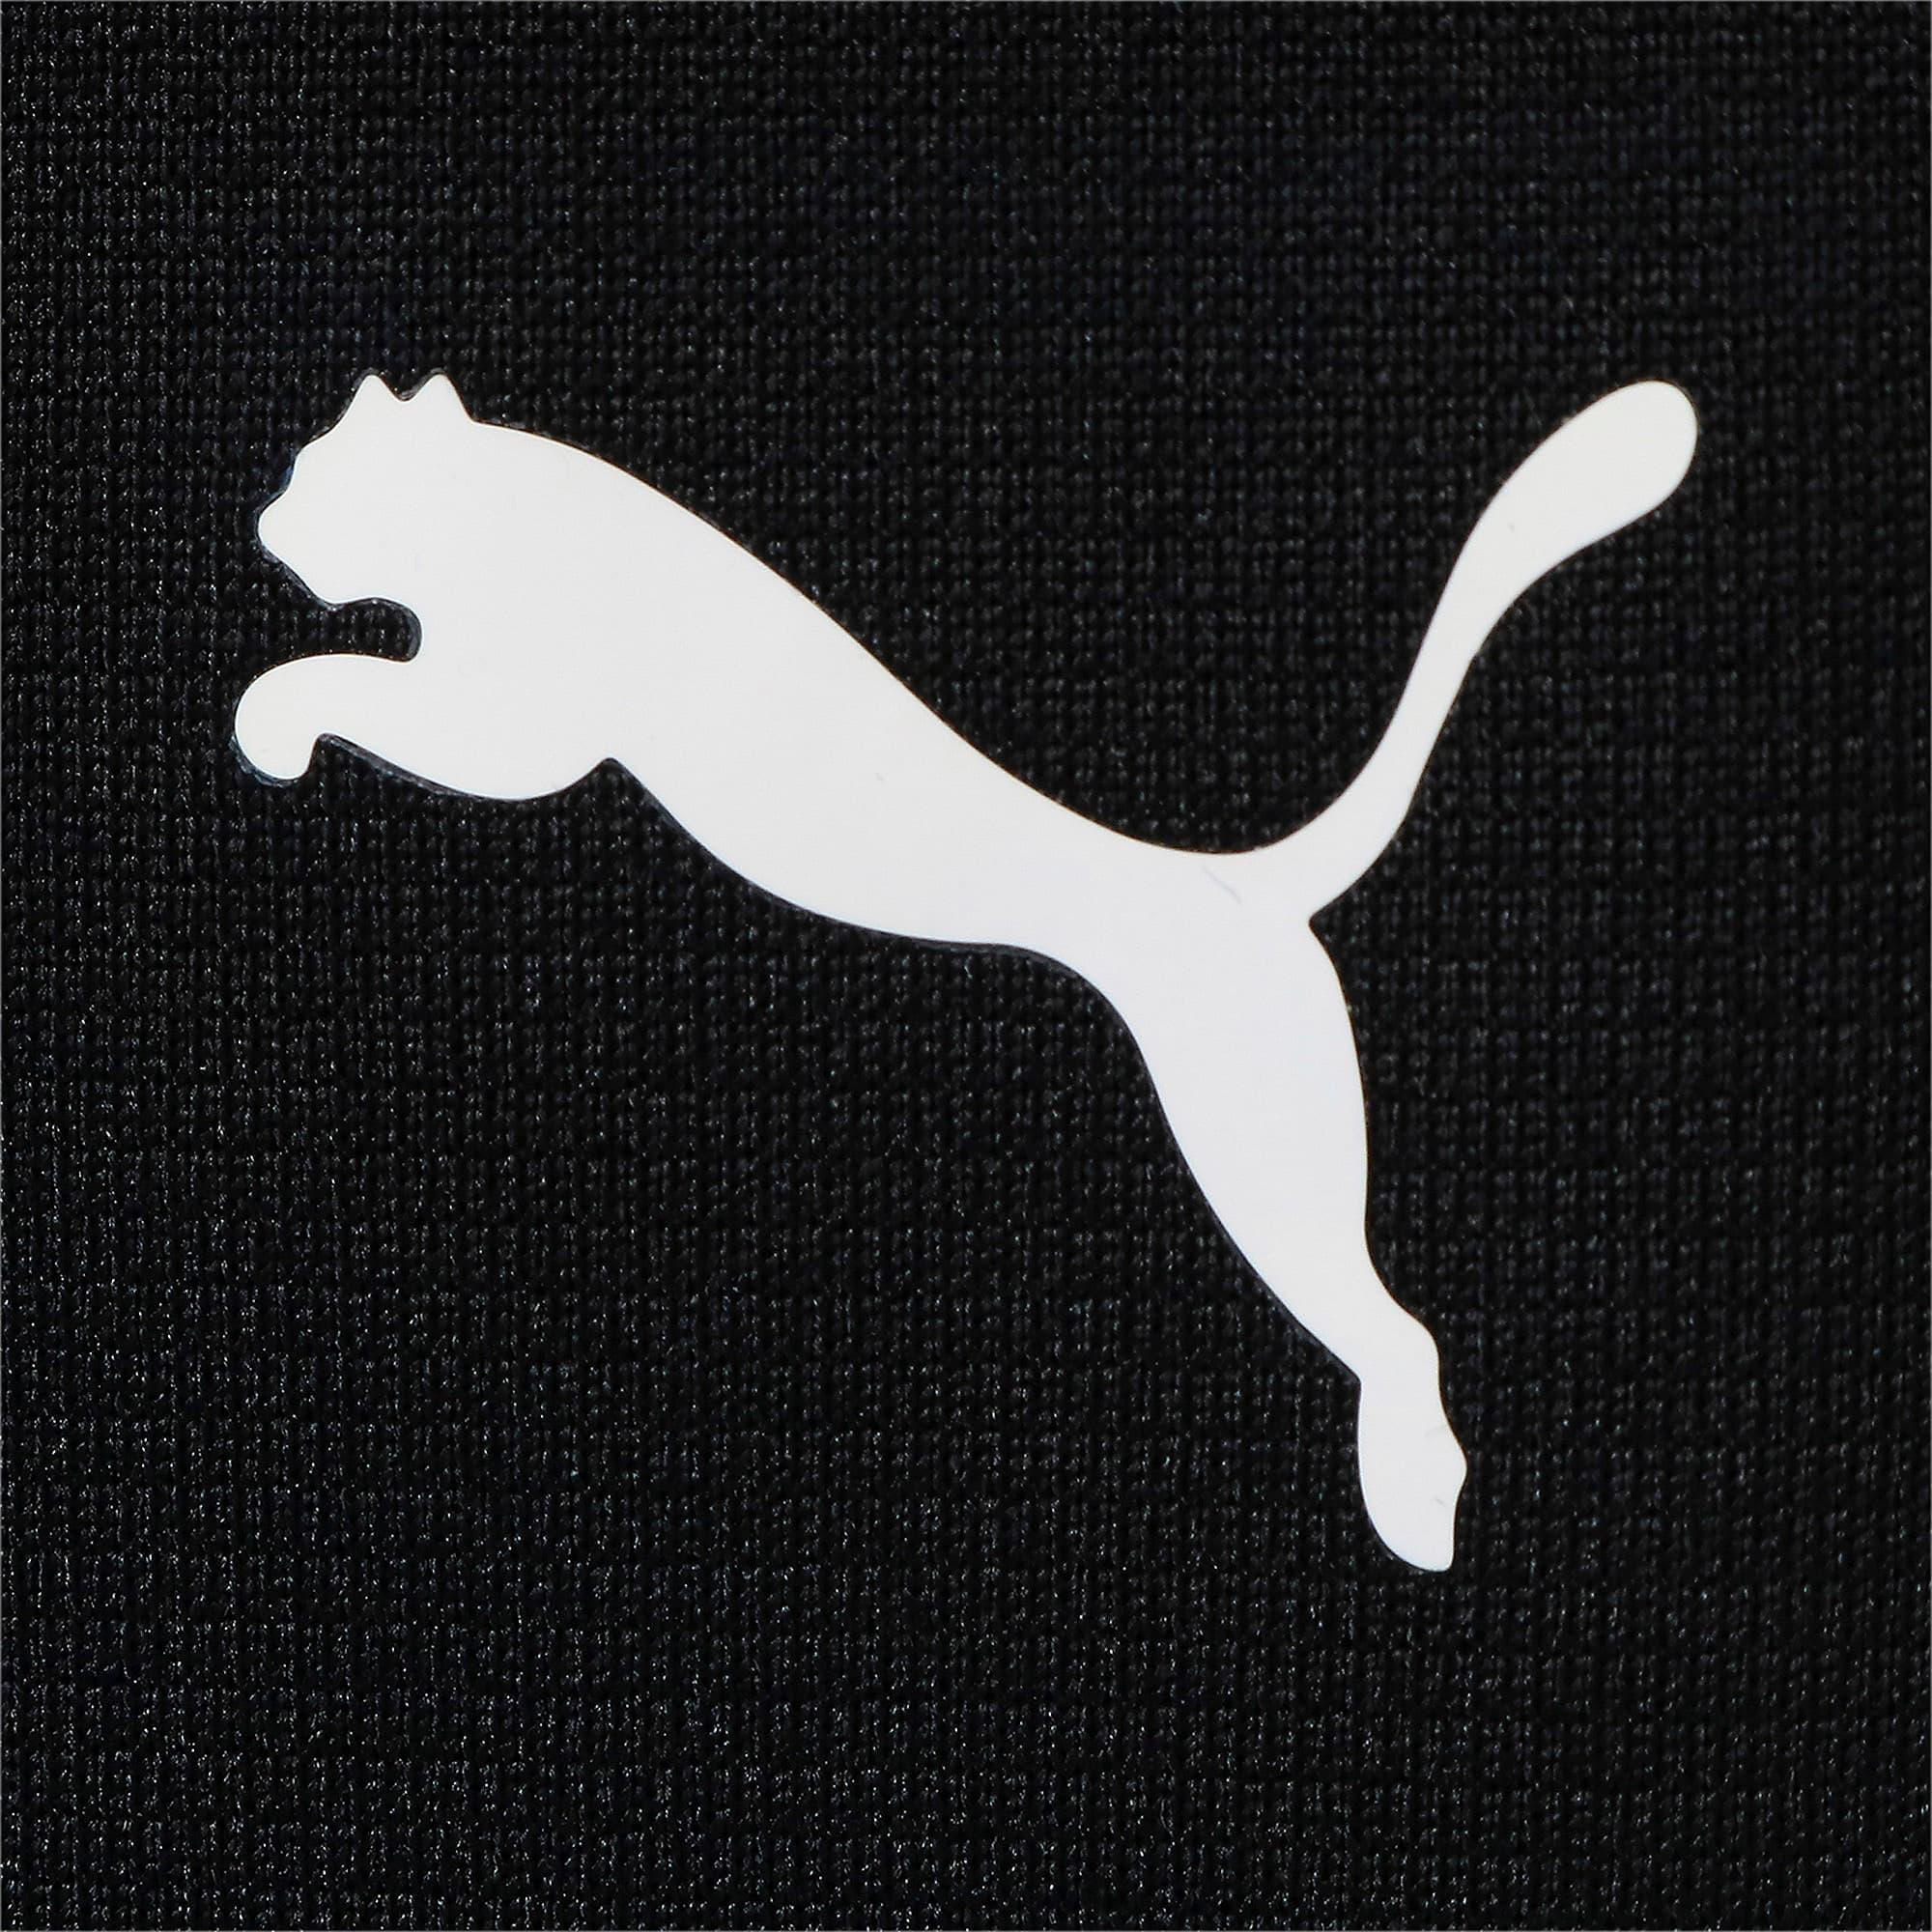 Thumbnail 4 of フィール イット ウィメンズ トレーニング パンツ, Puma Black, medium-JPN